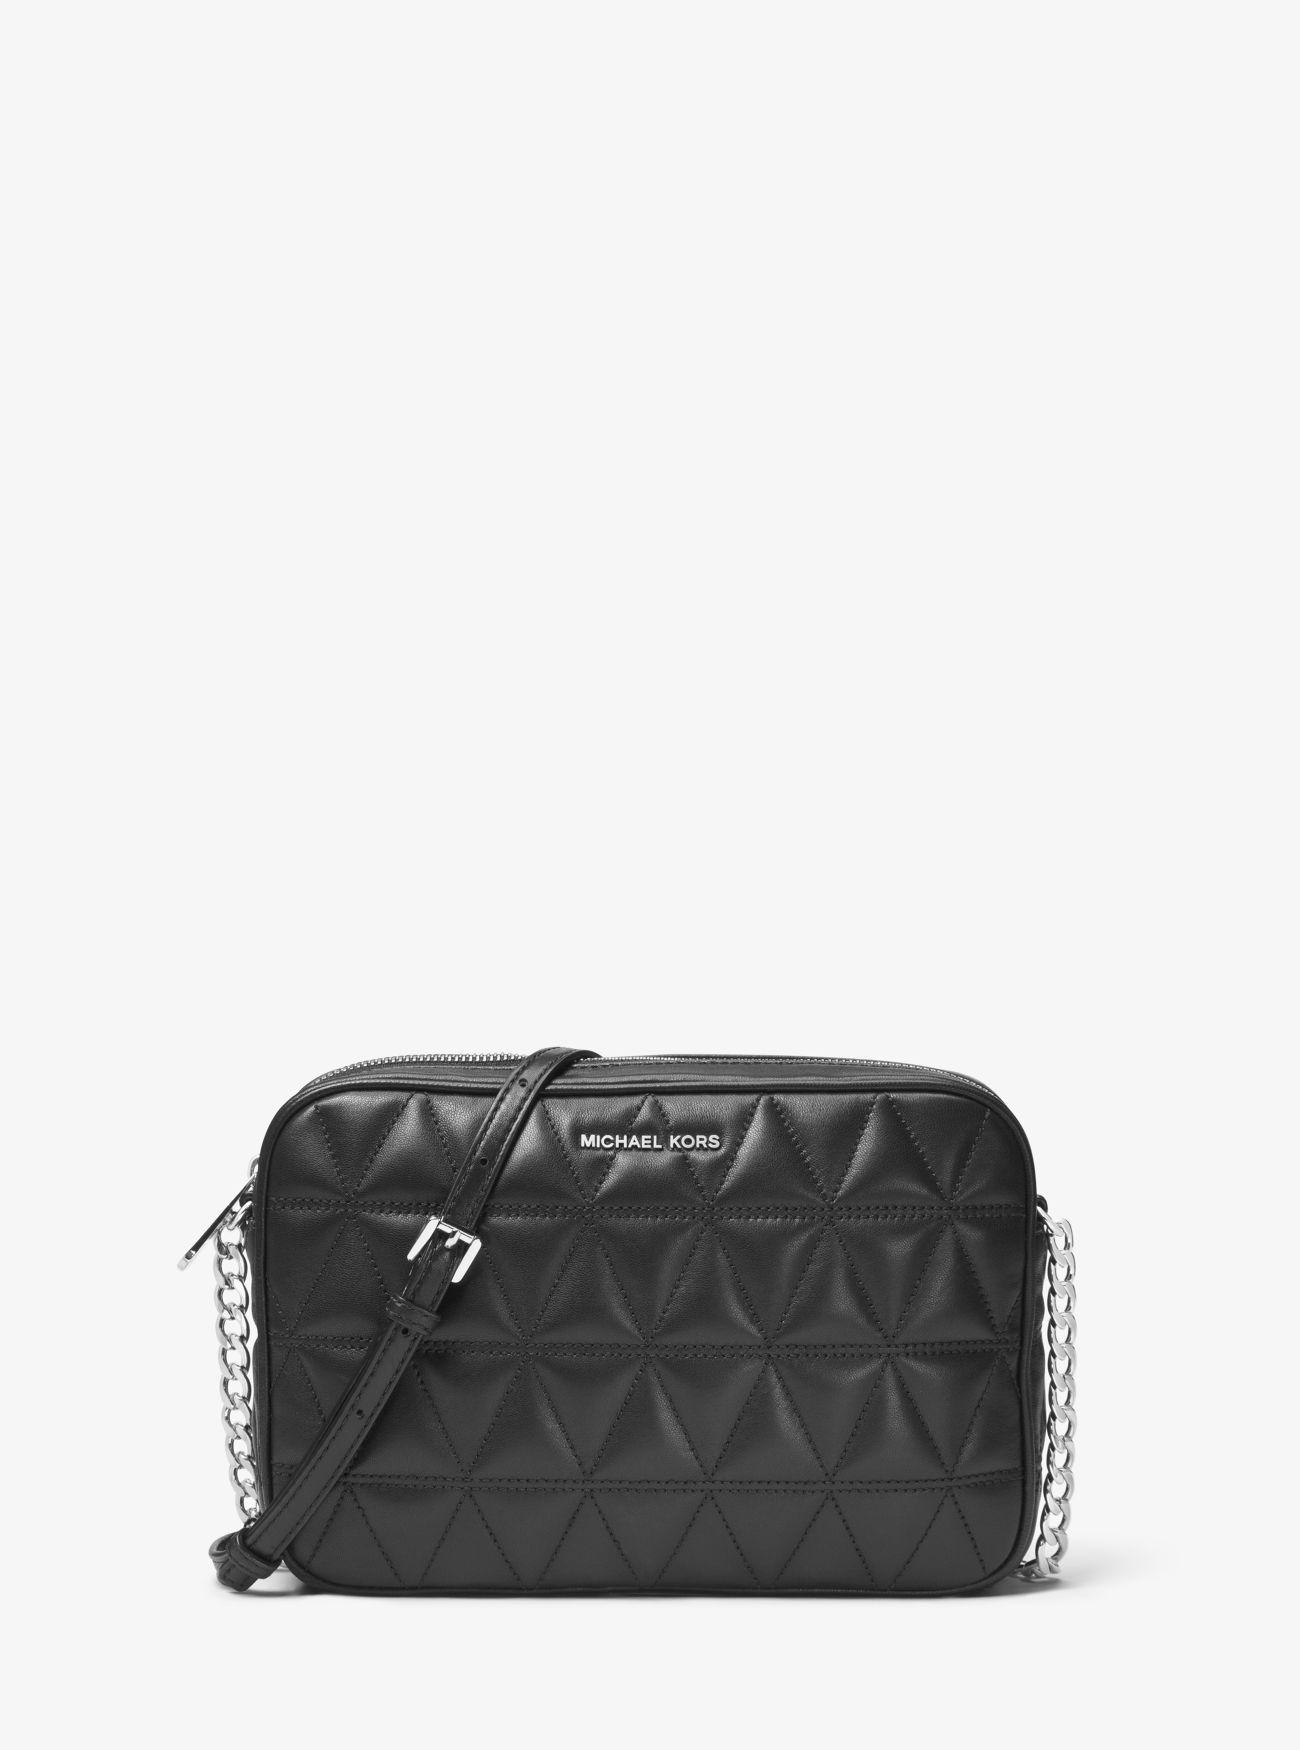 Jet Set Travel Quilted-leather Crossbody   Michael Kors : michael kors black quilted handbag - Adamdwight.com